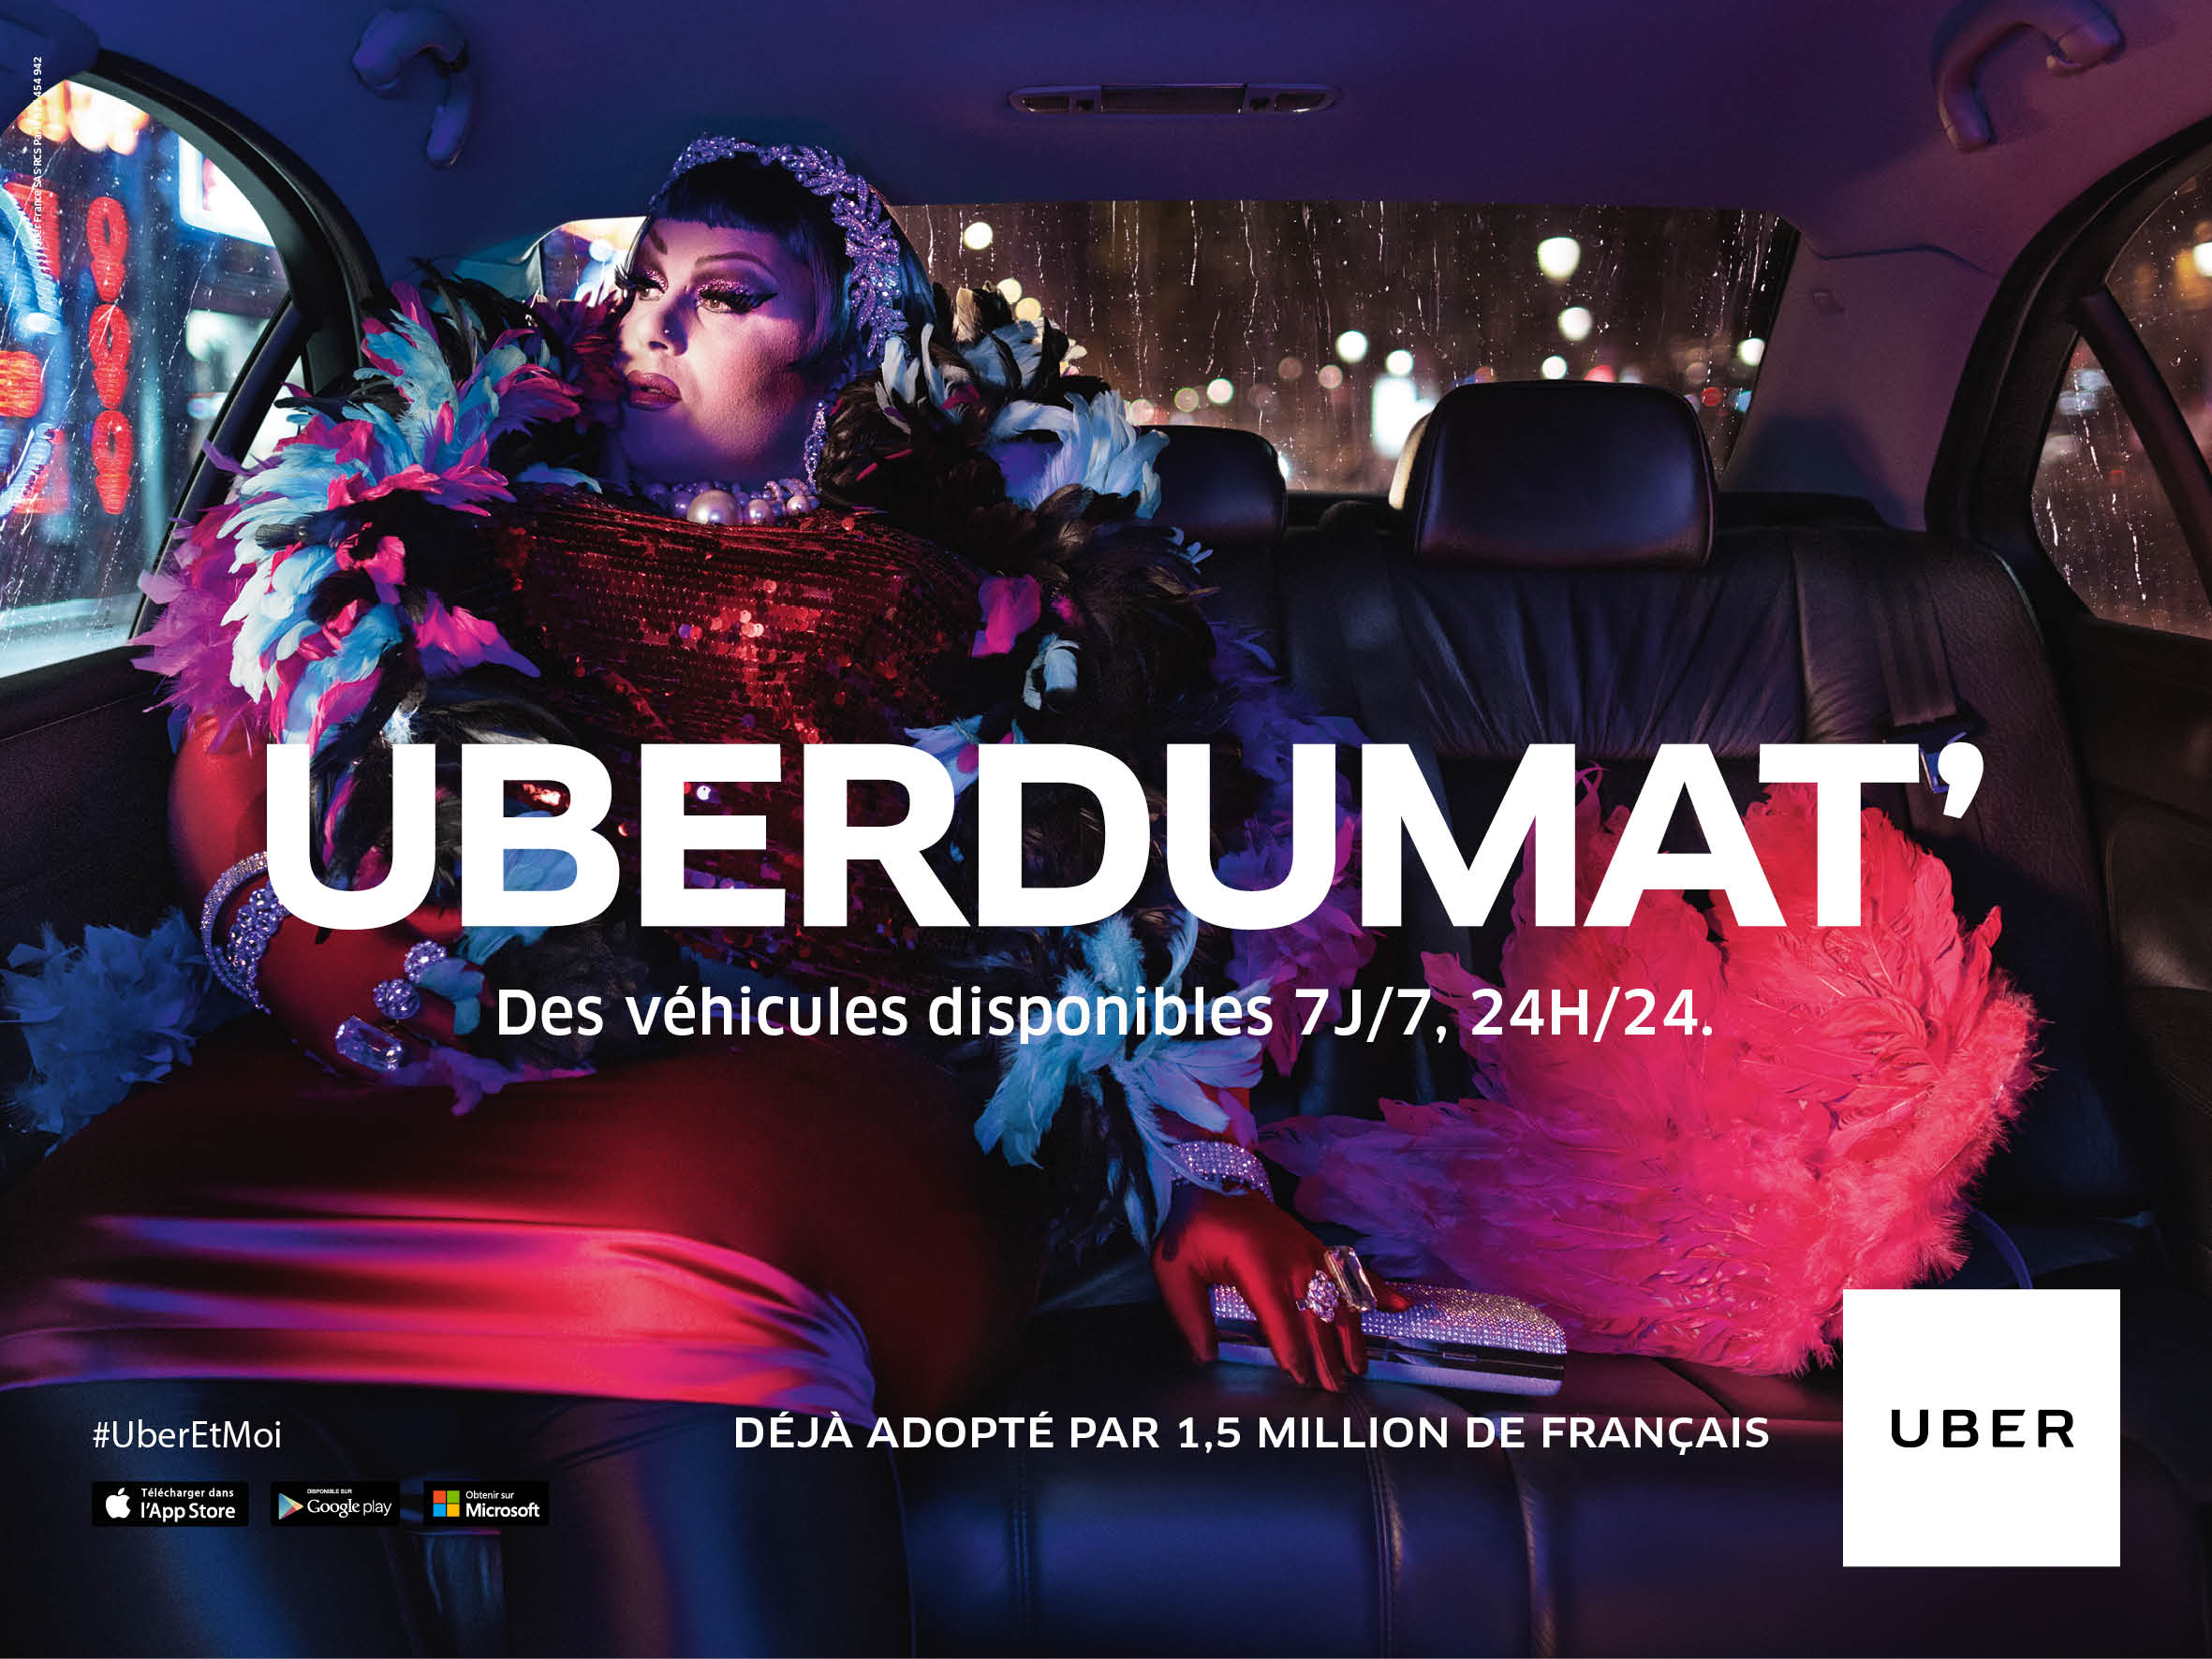 uber-france-publicite-marketing-application-utilisateurs-passagers-mars-2016-agence-marcel-publicis-2